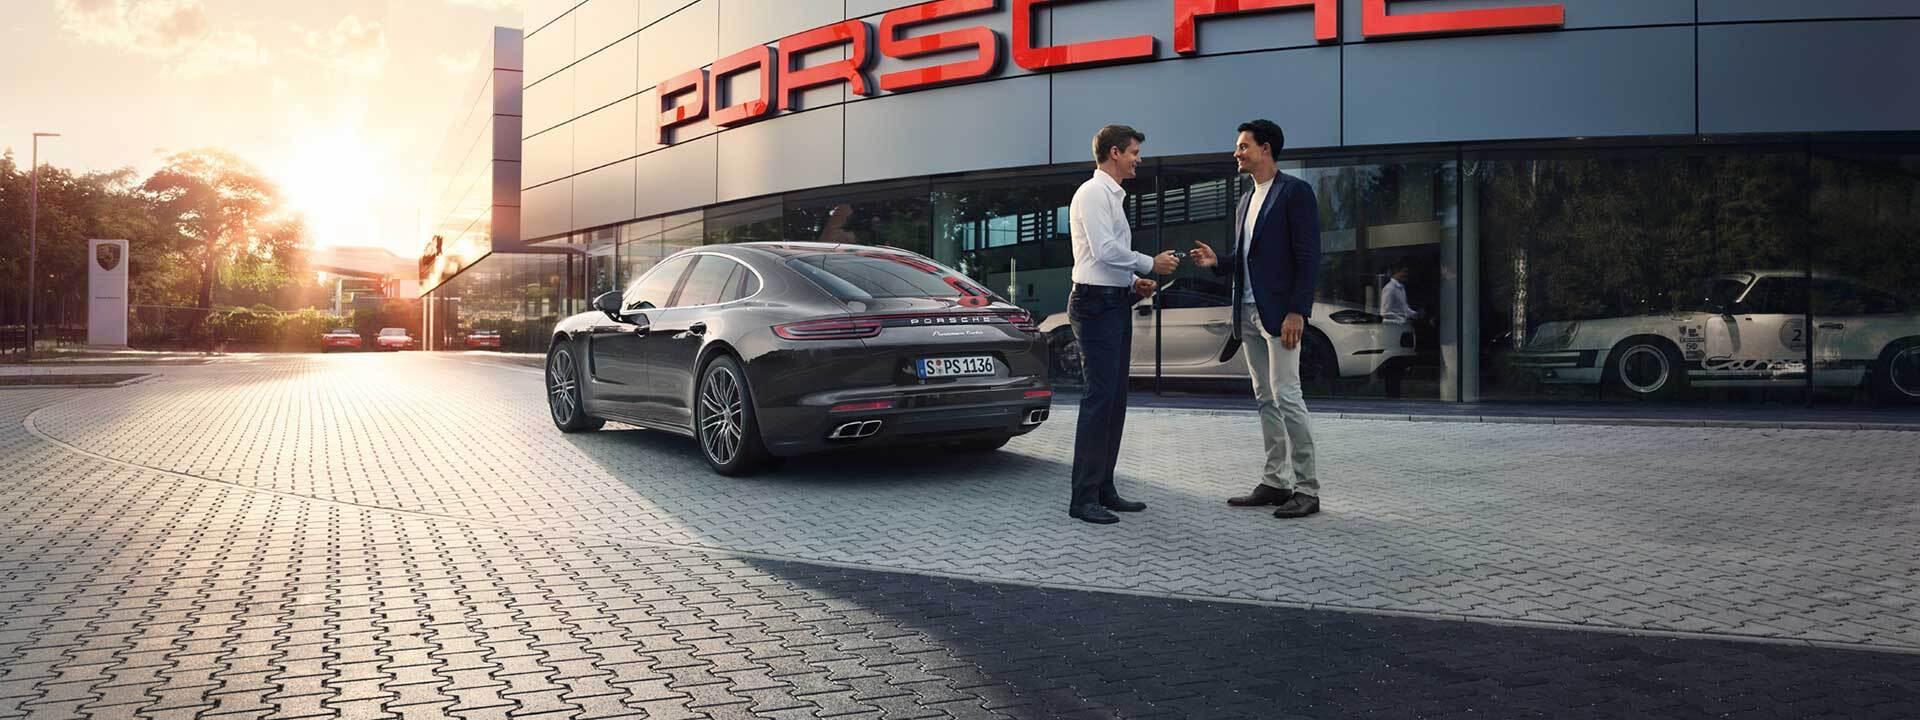 Two people exchanging keys to a Porsche in Newark, DE